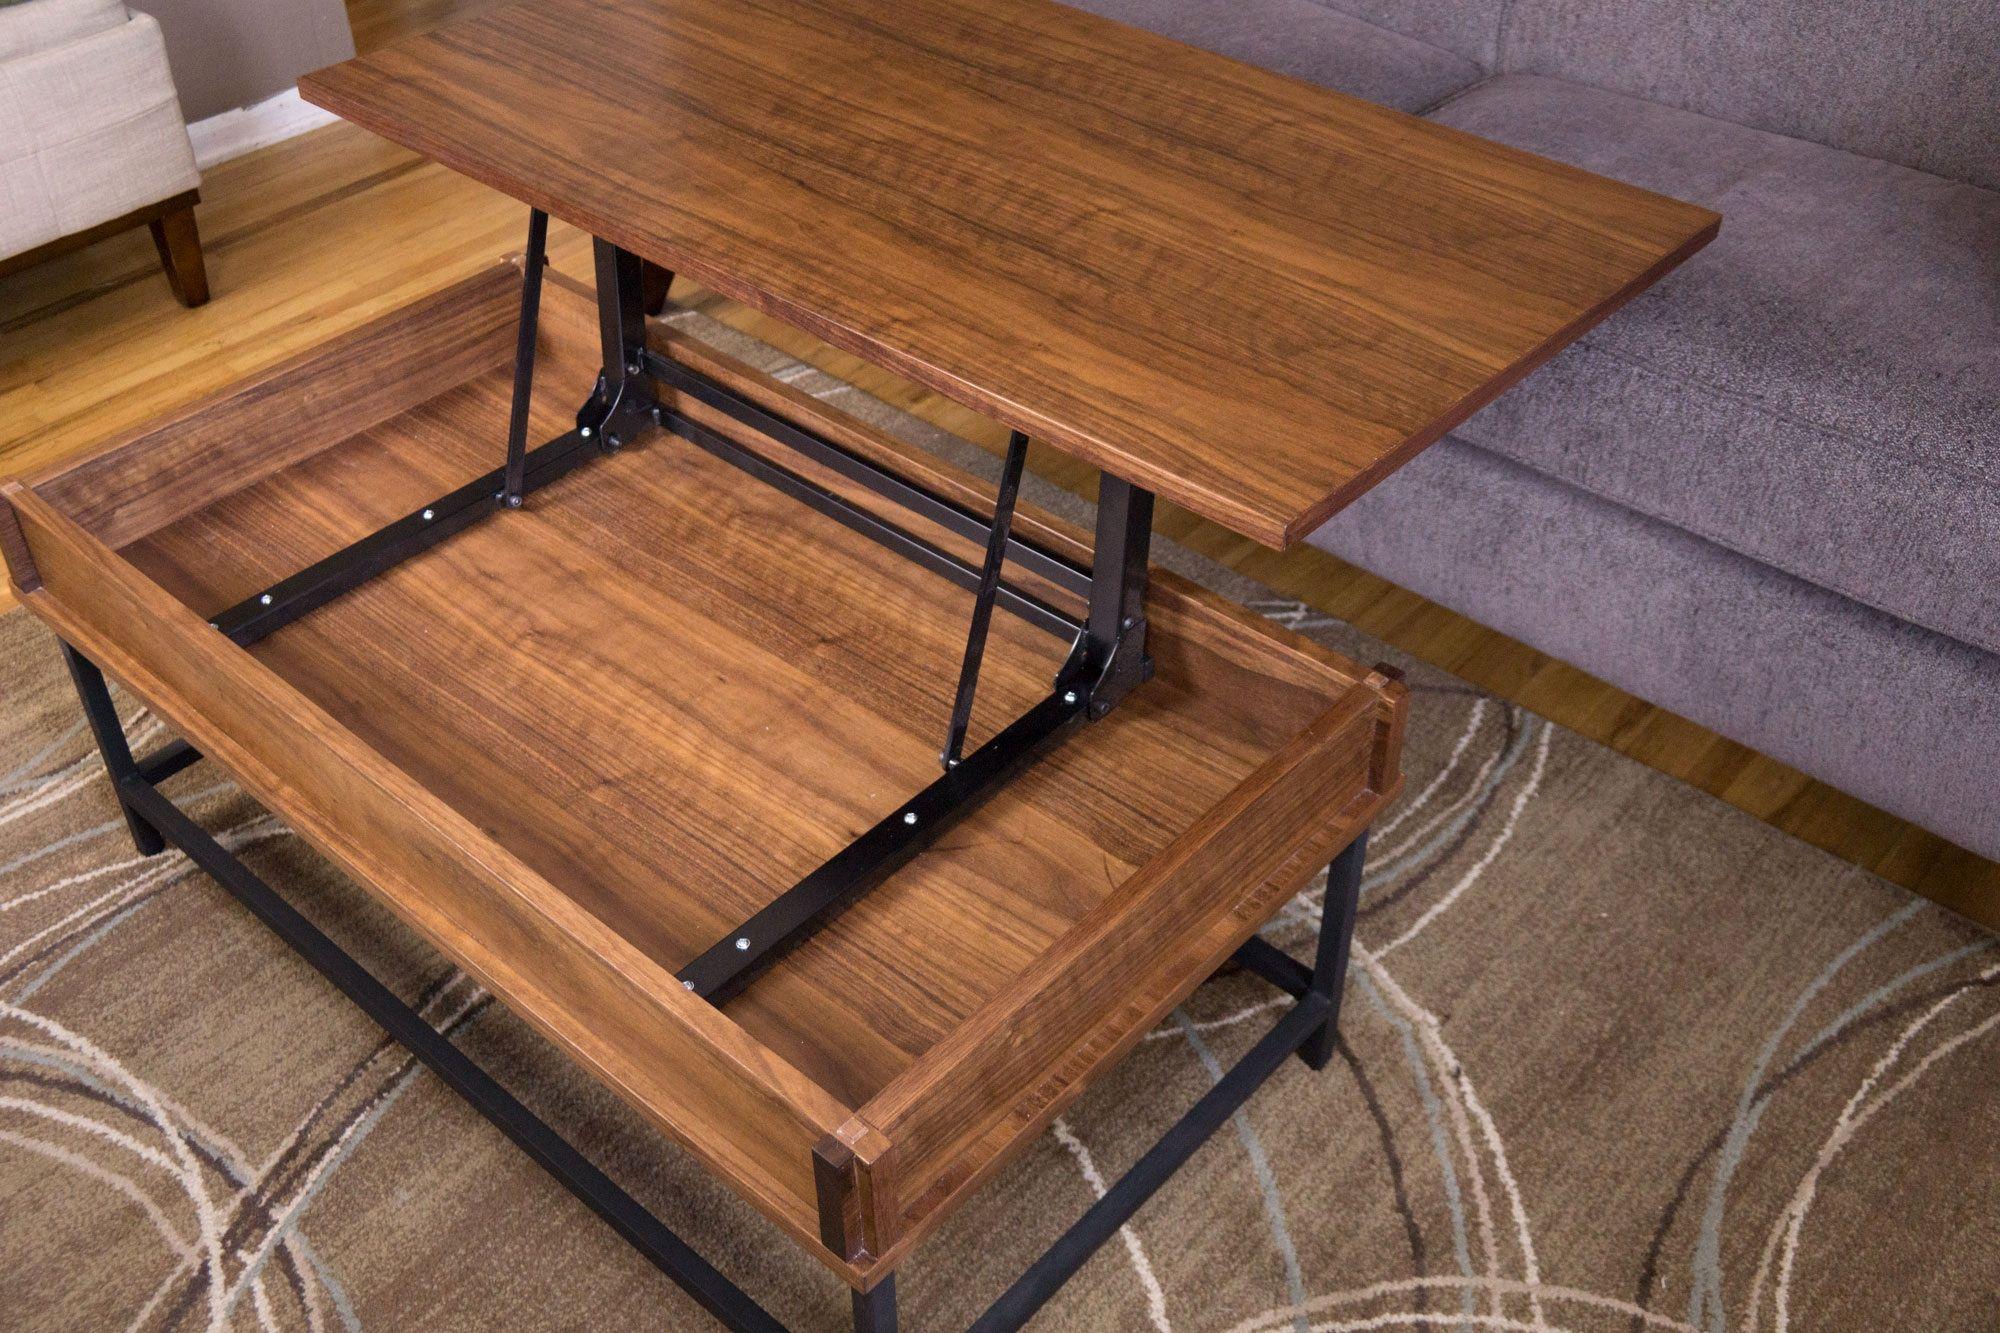 Raising Coffee Table Hipenmoedernl with regard to dimensions 2000 X 1333